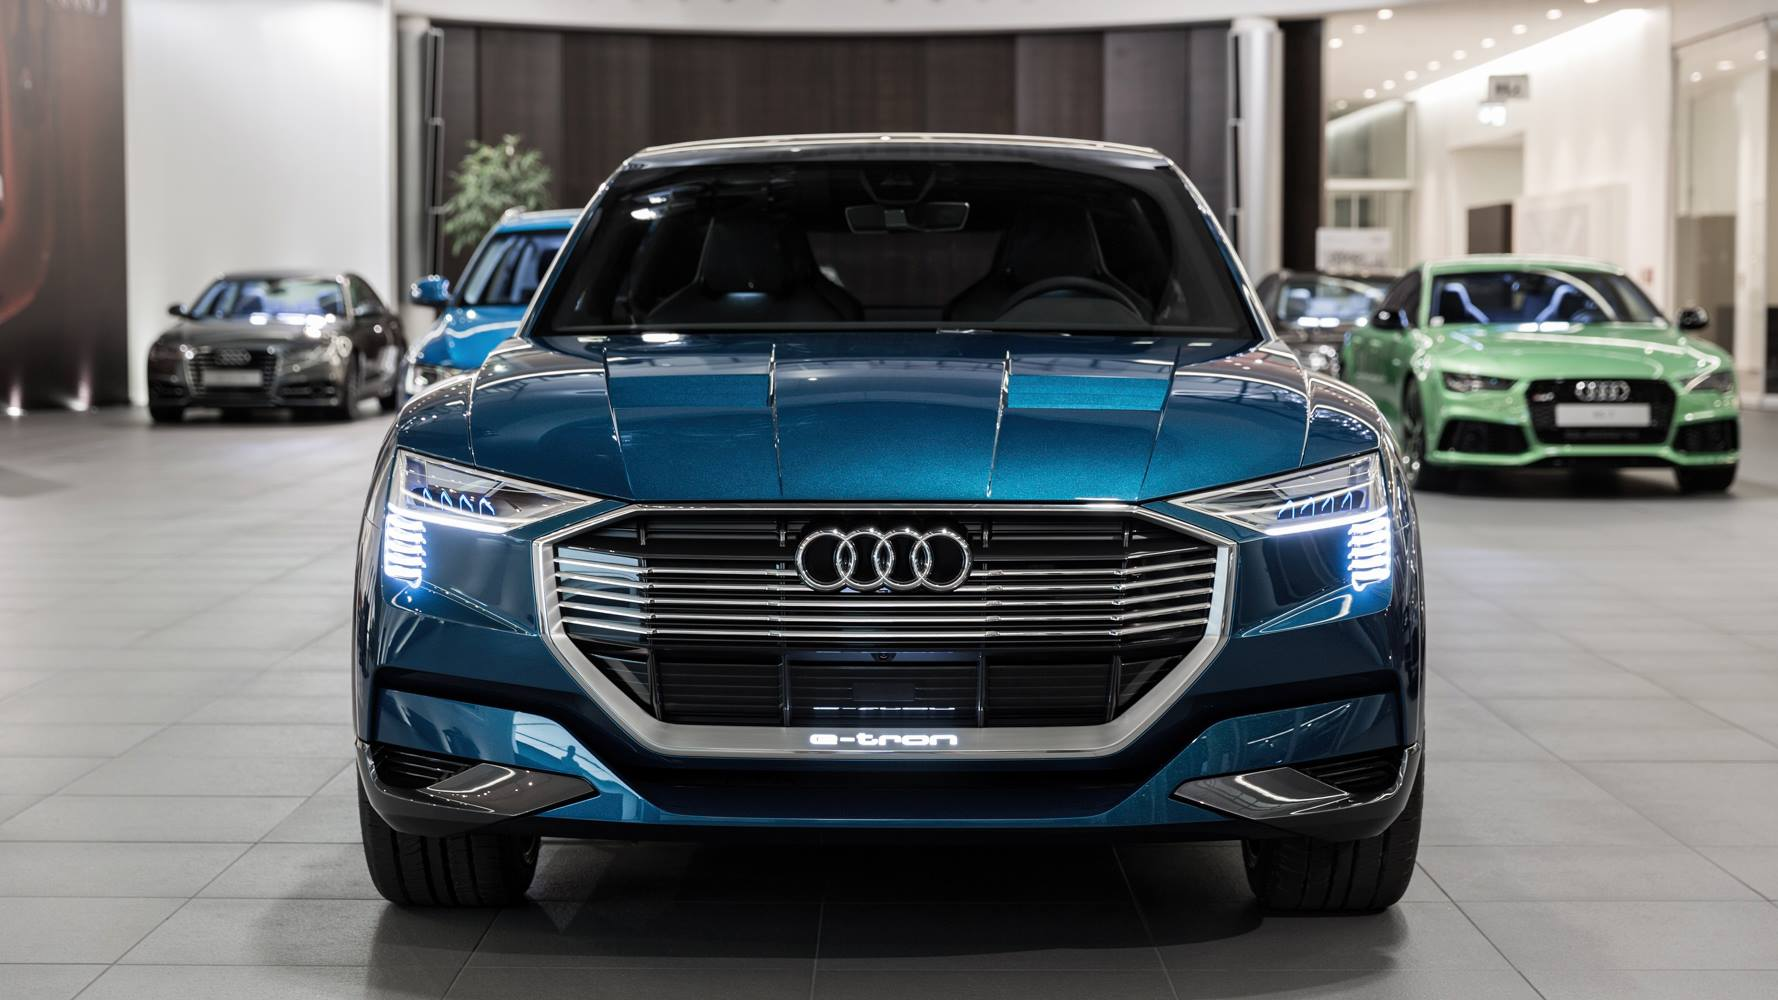 The Future Is Here Audi E Tron Quattro Concept Arrives At